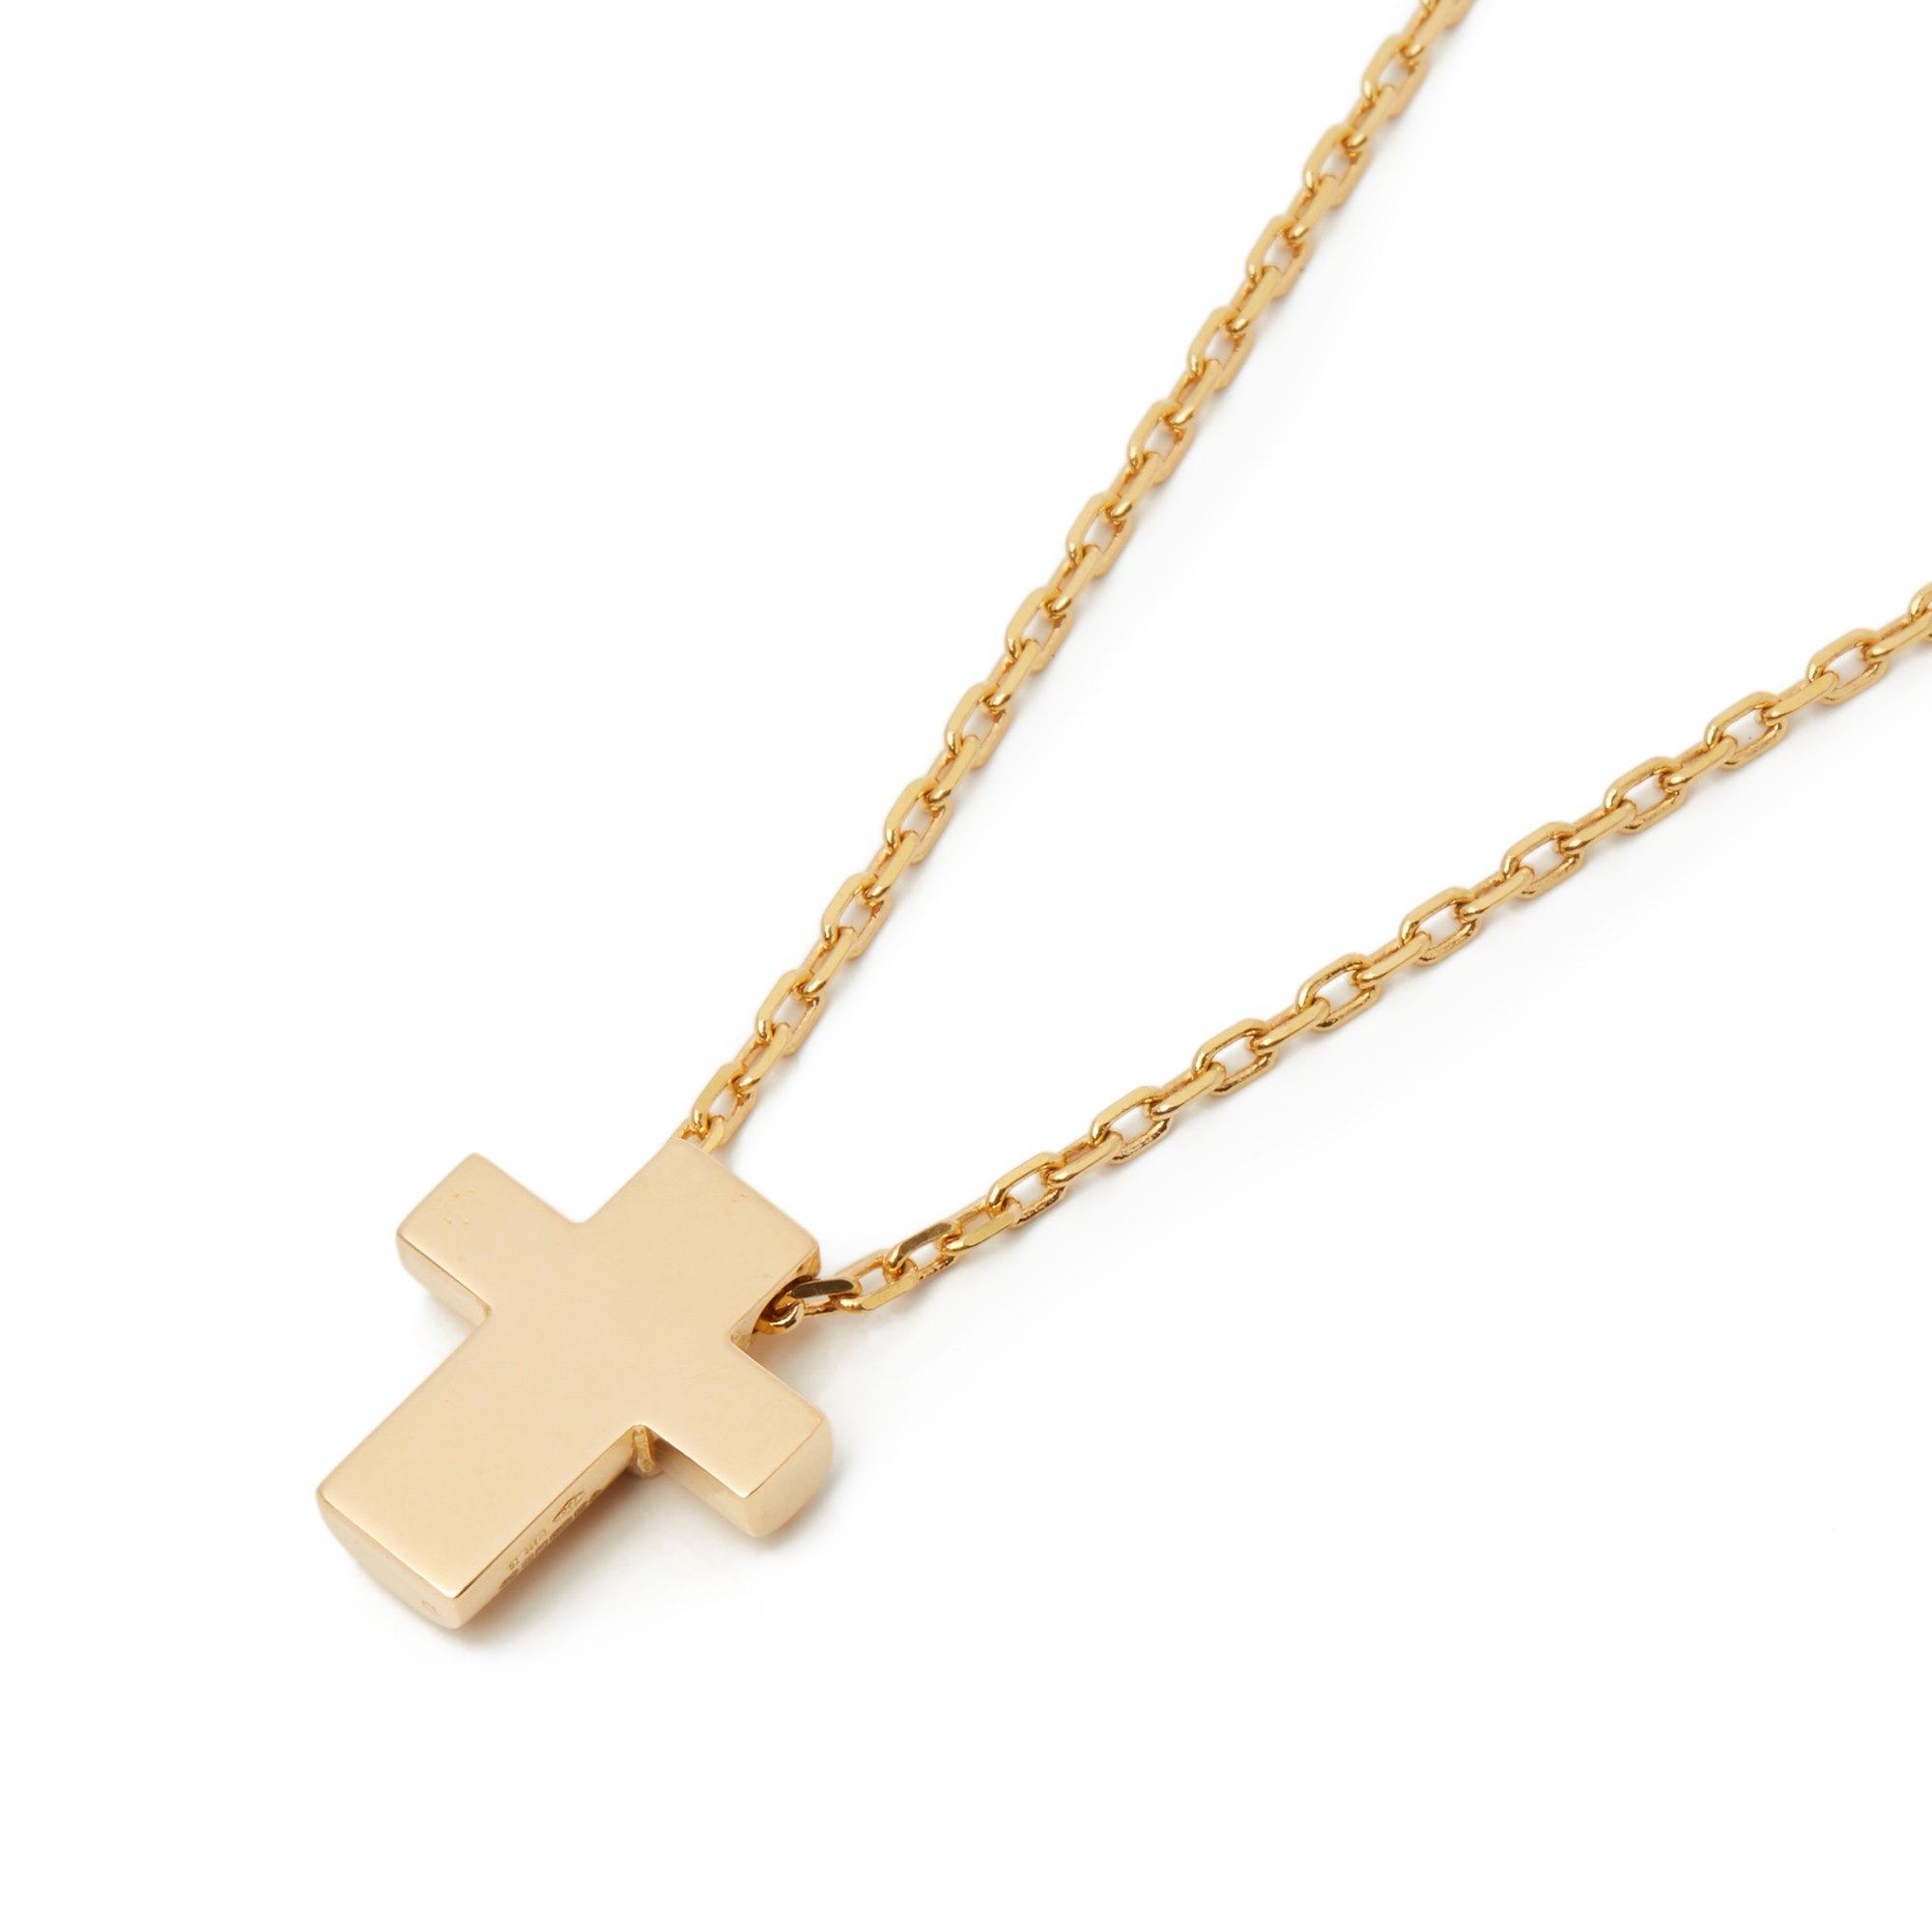 Asprey 18k Yellow Gold Cross Pendant Necklace - Image 8 of 8